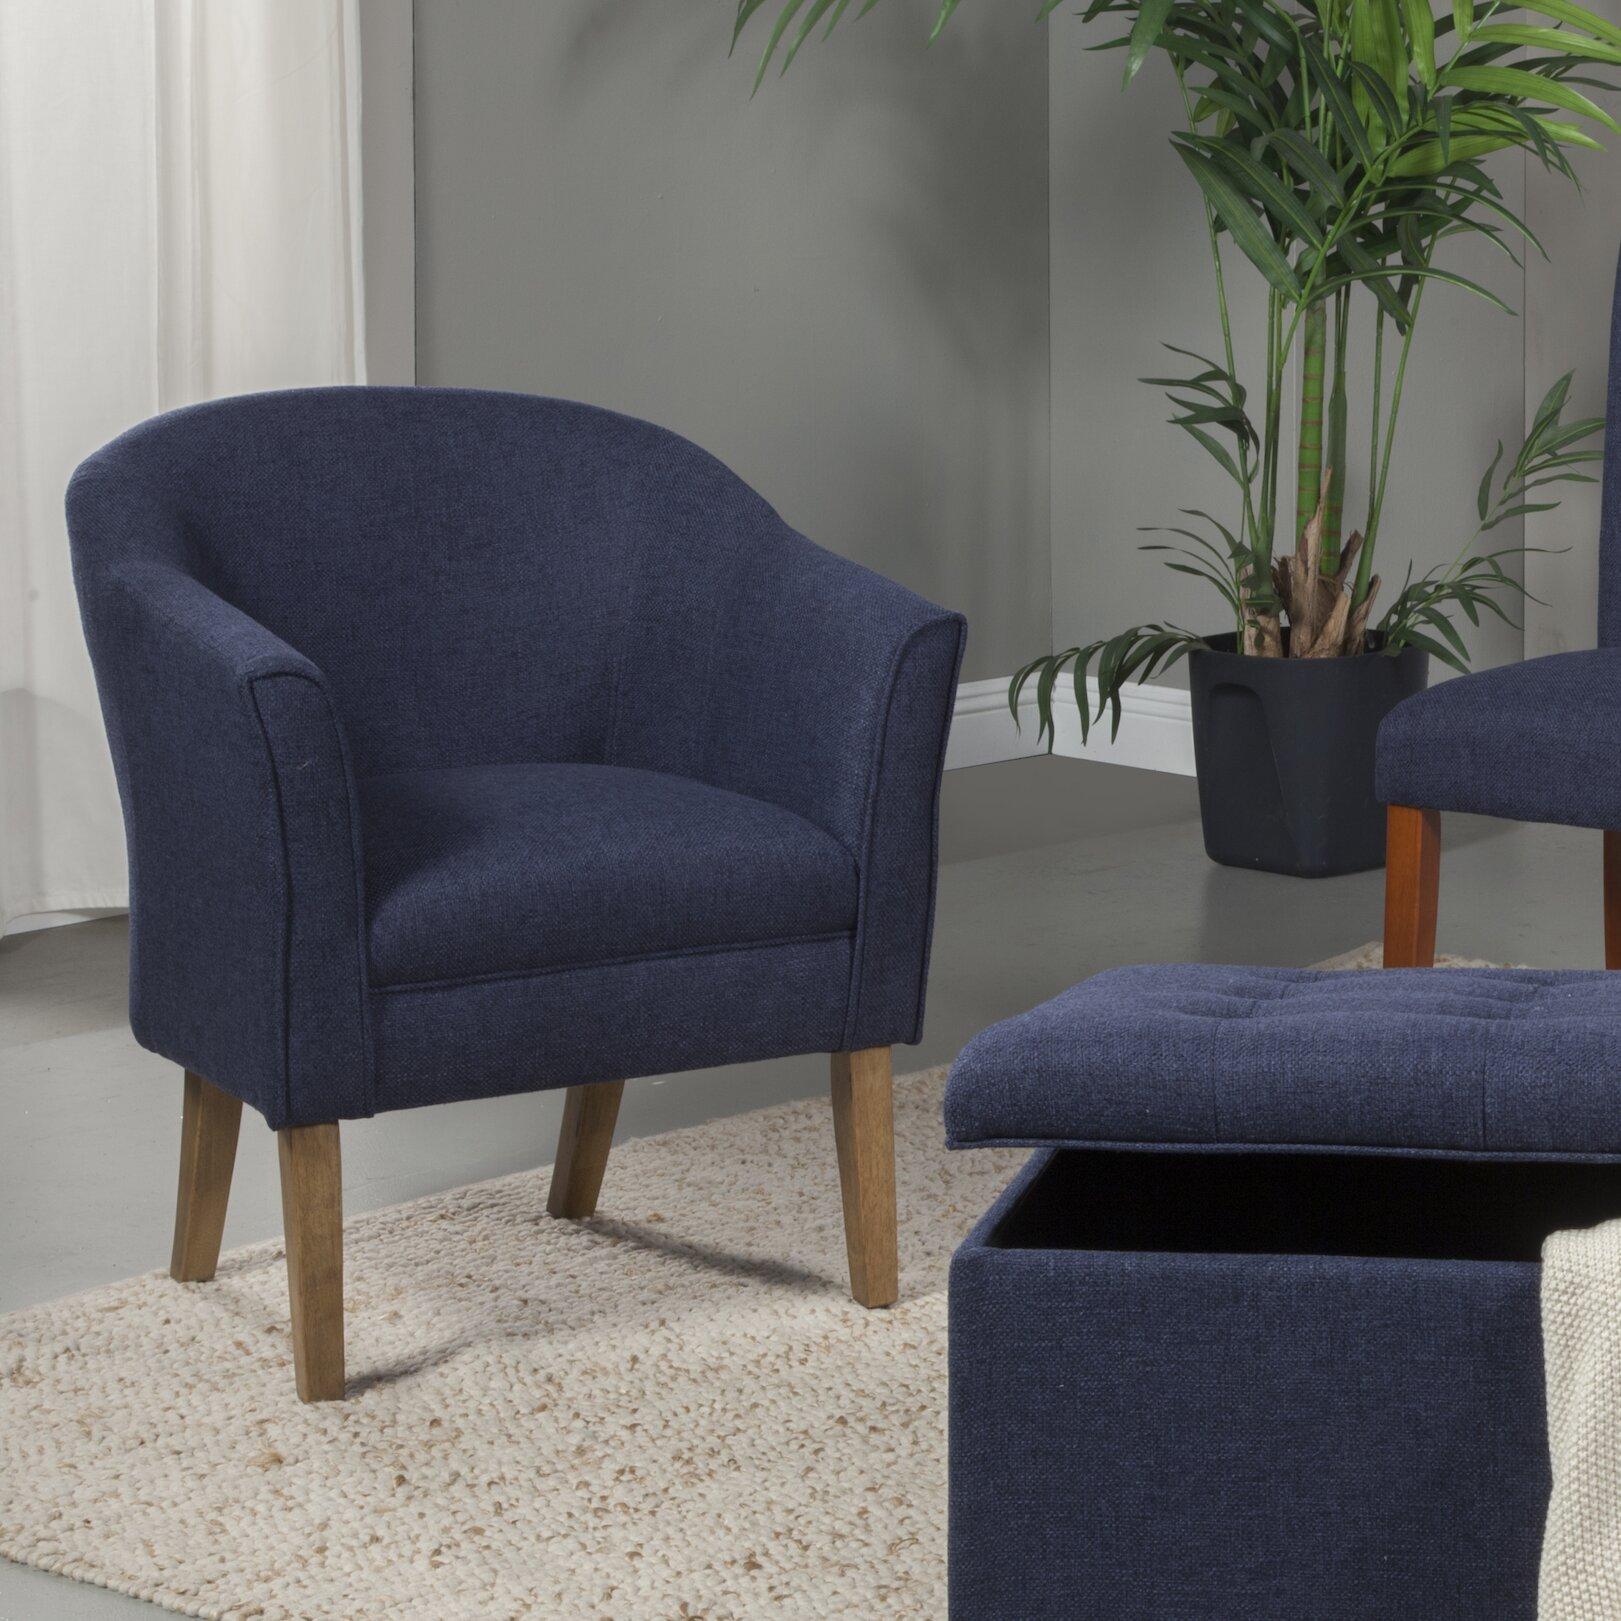 Homepop Upholstered Barrel Chair Amp Reviews Wayfair